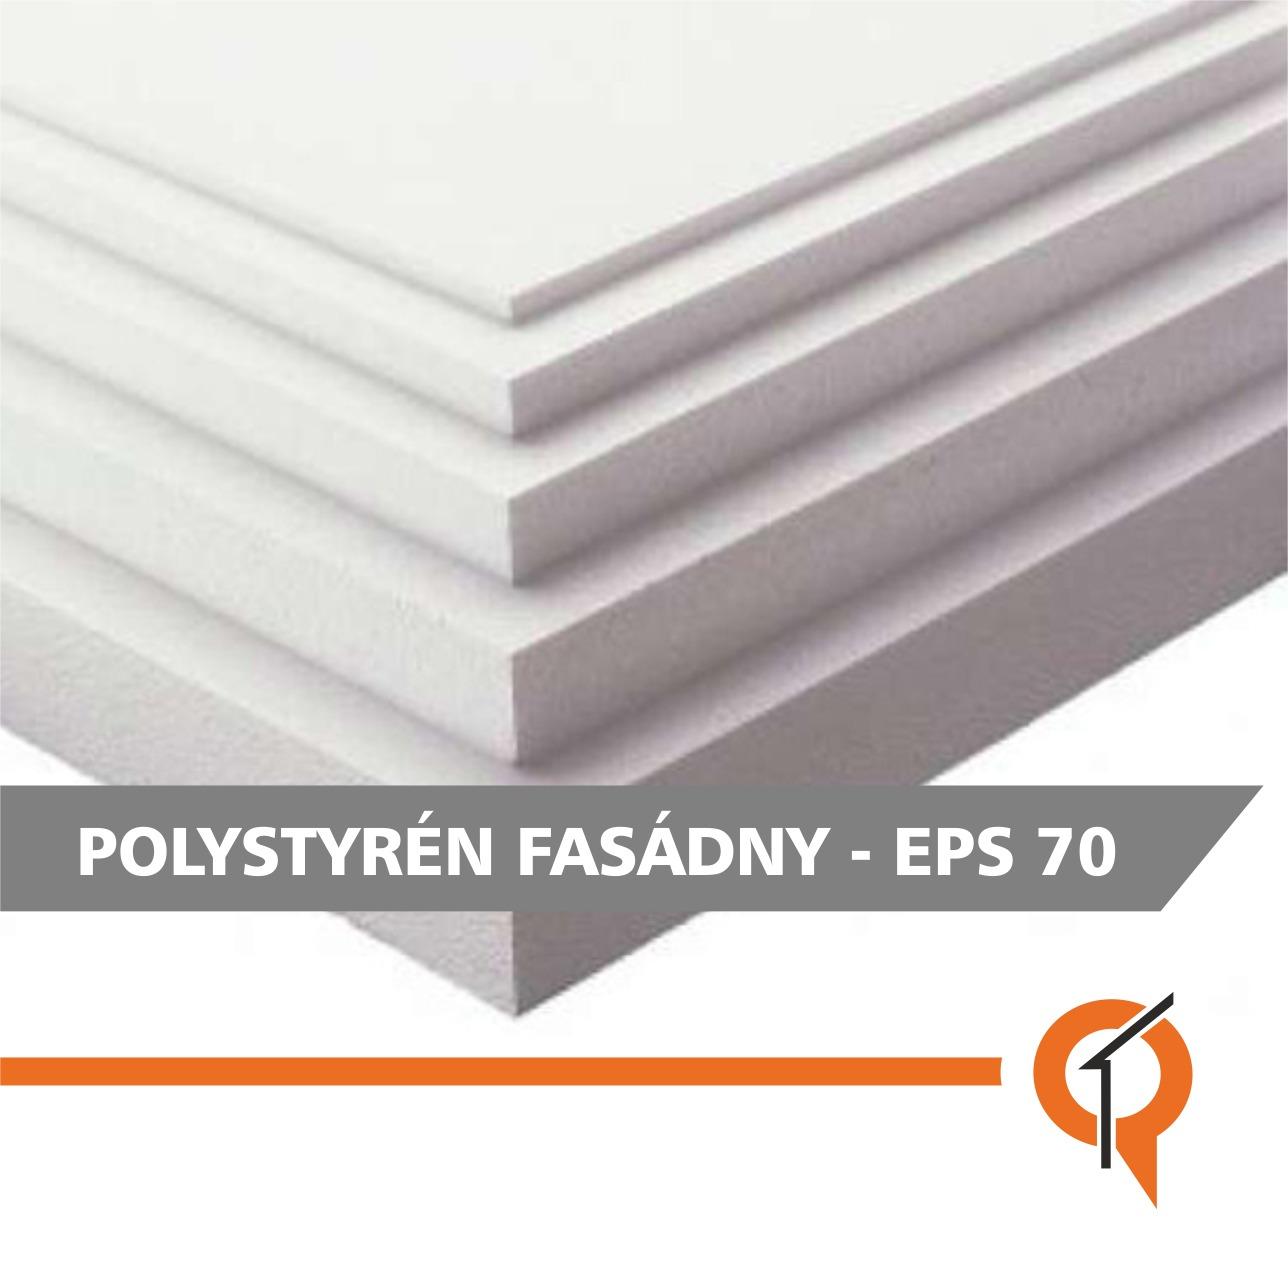 eps_70_polystyren_fasadny_qtrend